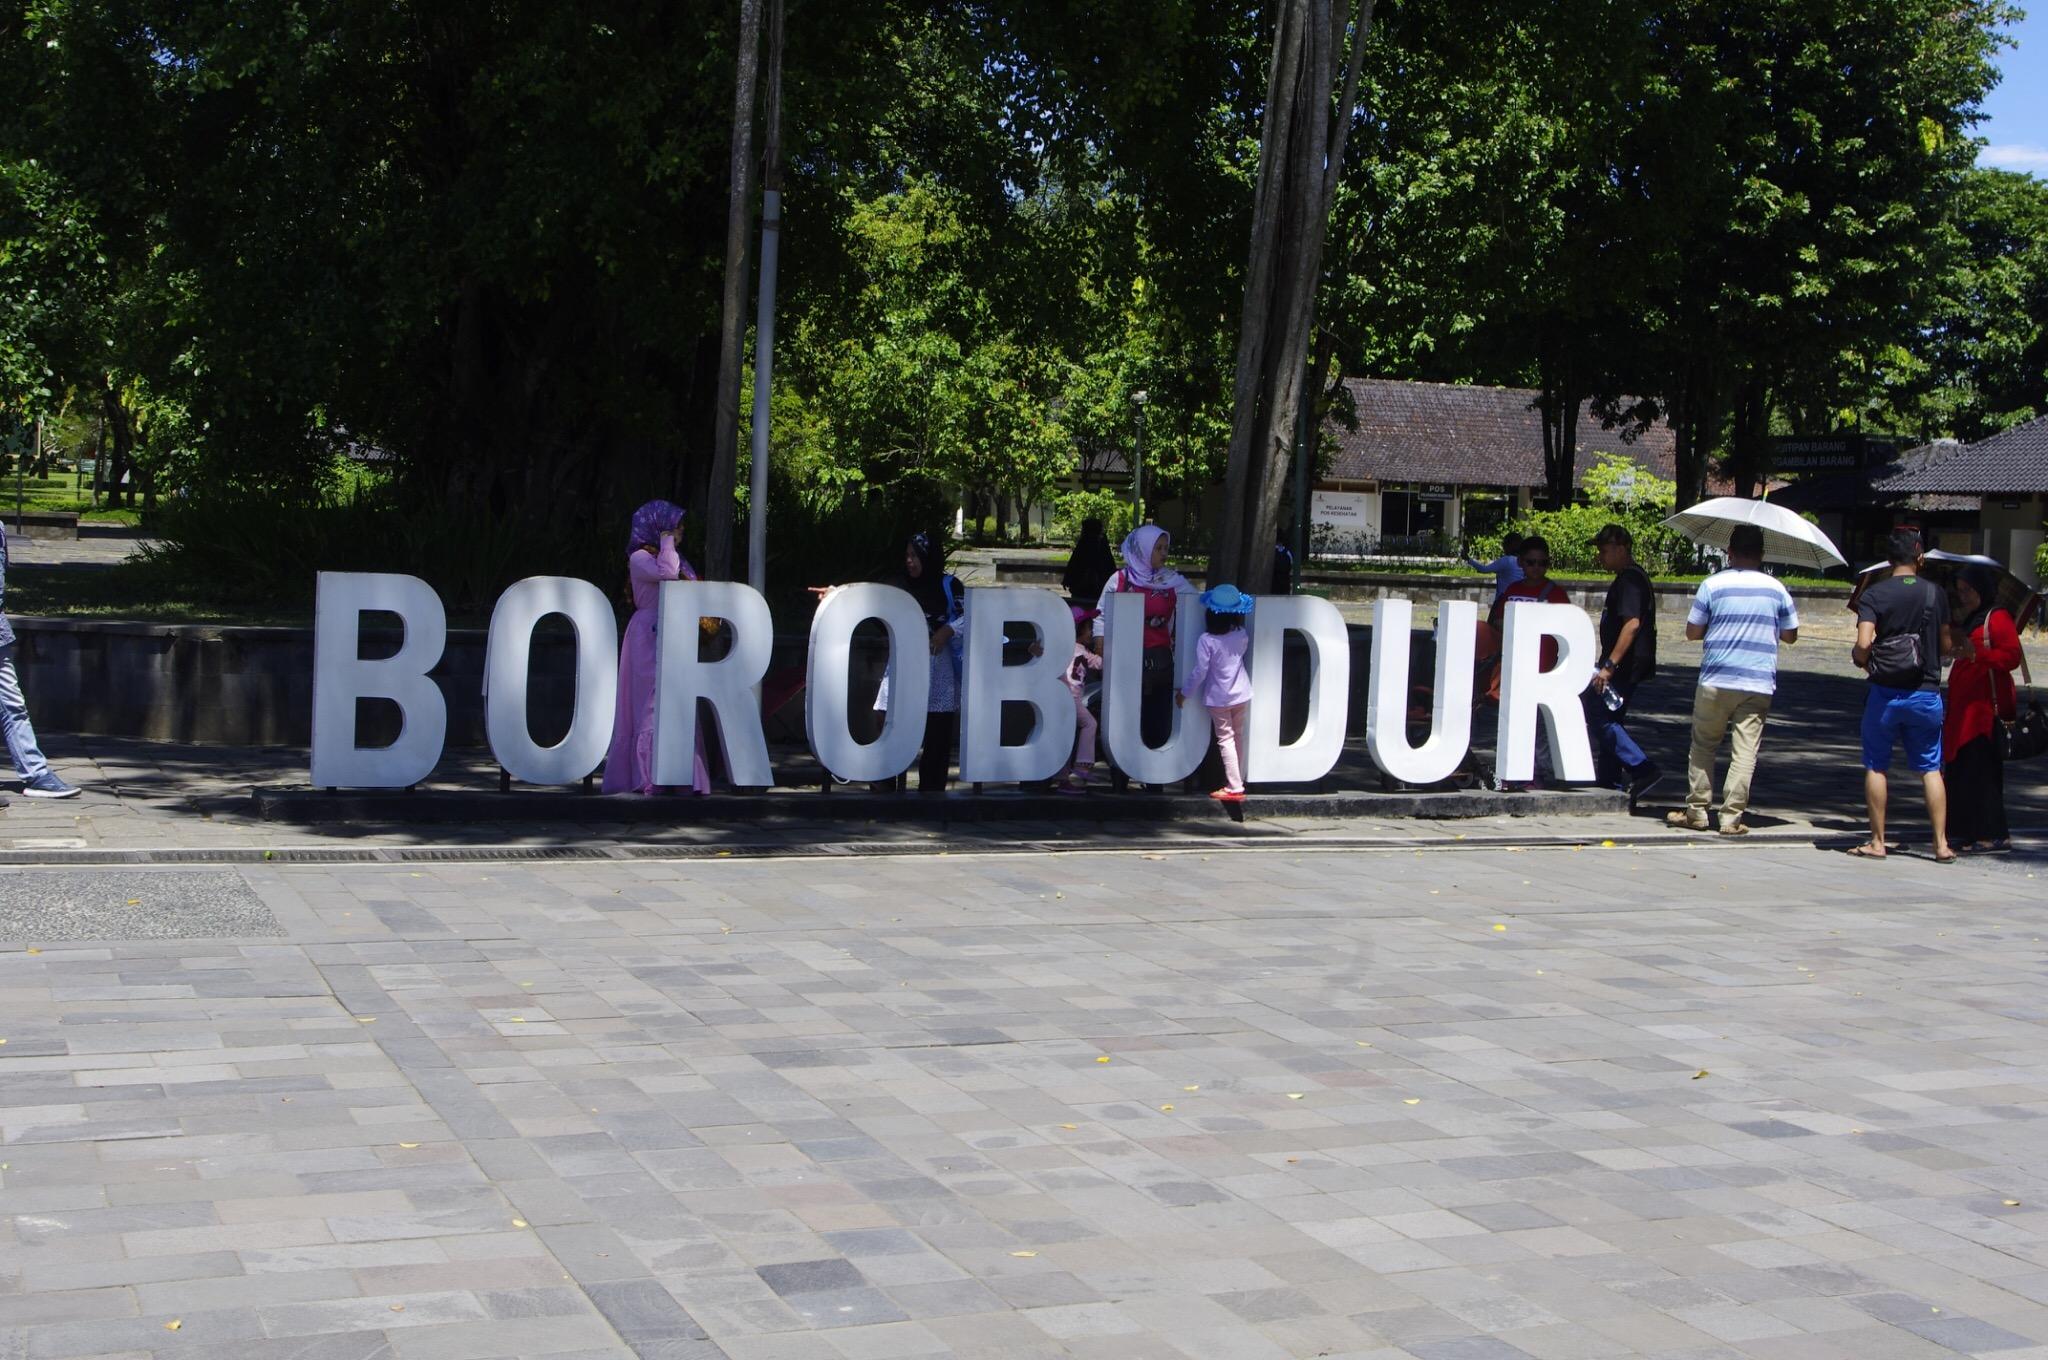 Borobudur:ボロブドゥール遺跡に行ってきた!